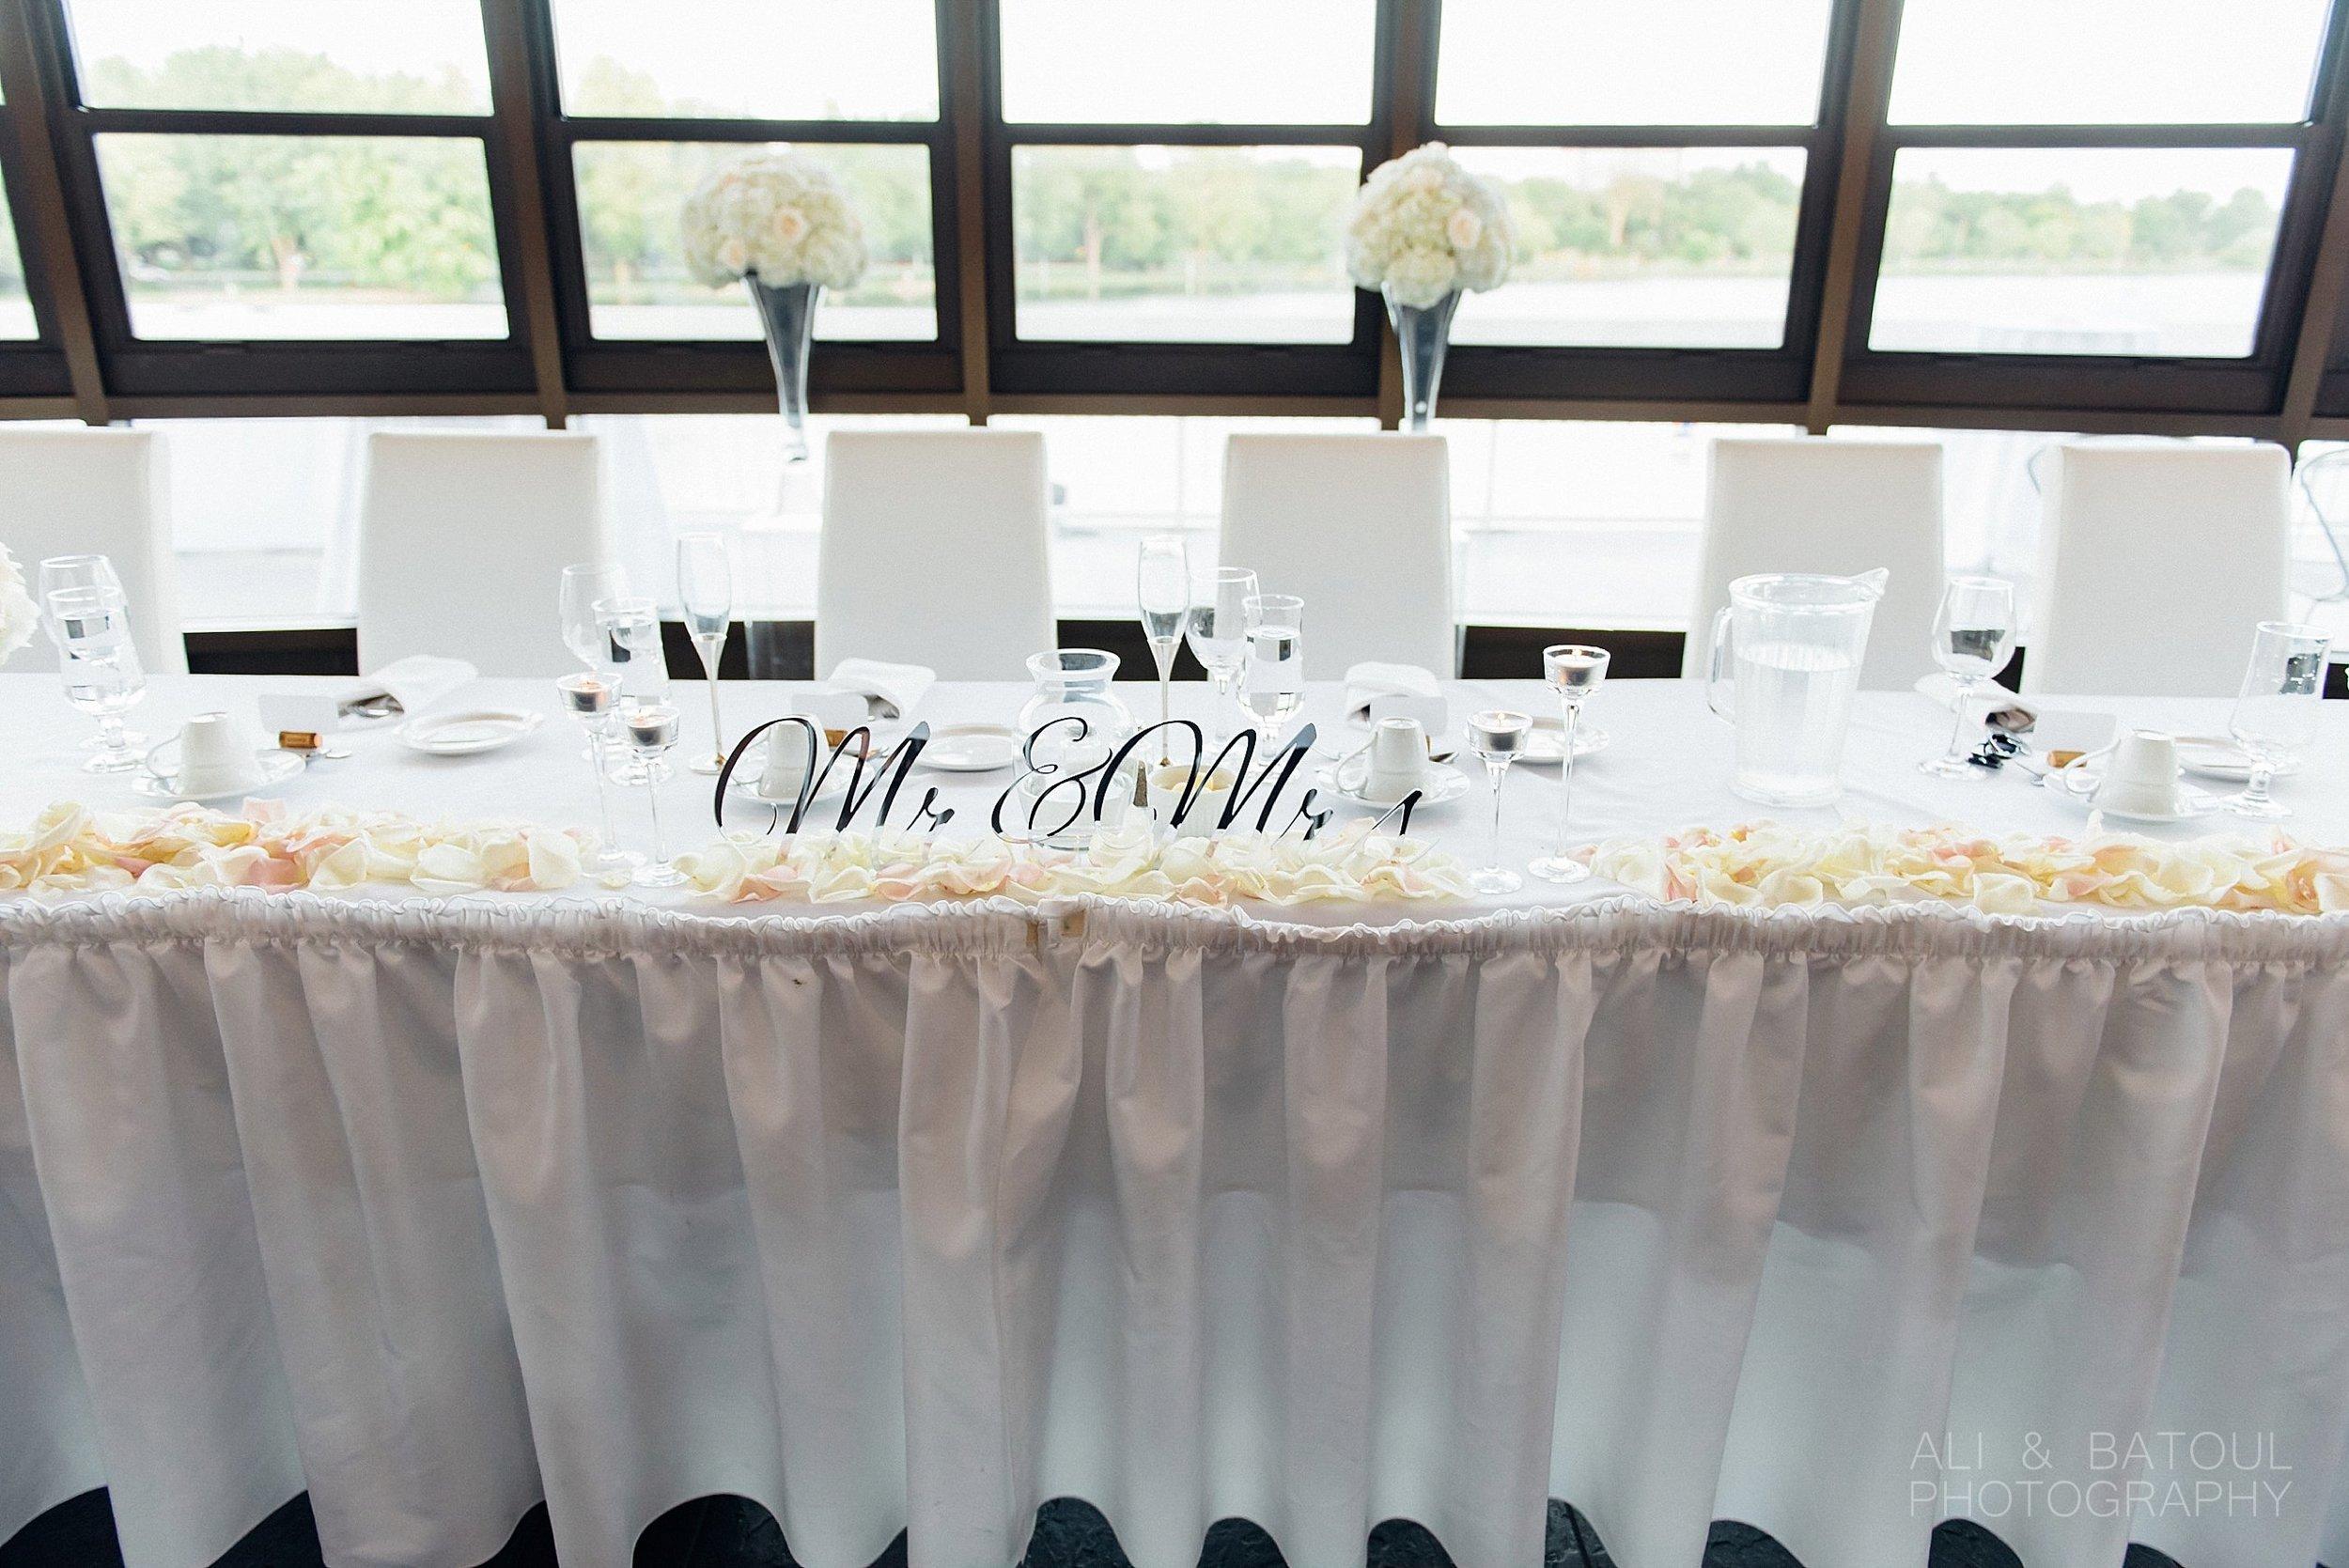 Ali & Batoul Photography - Documentary Fine Art Ottawa Wedding Photography_0074.jpg